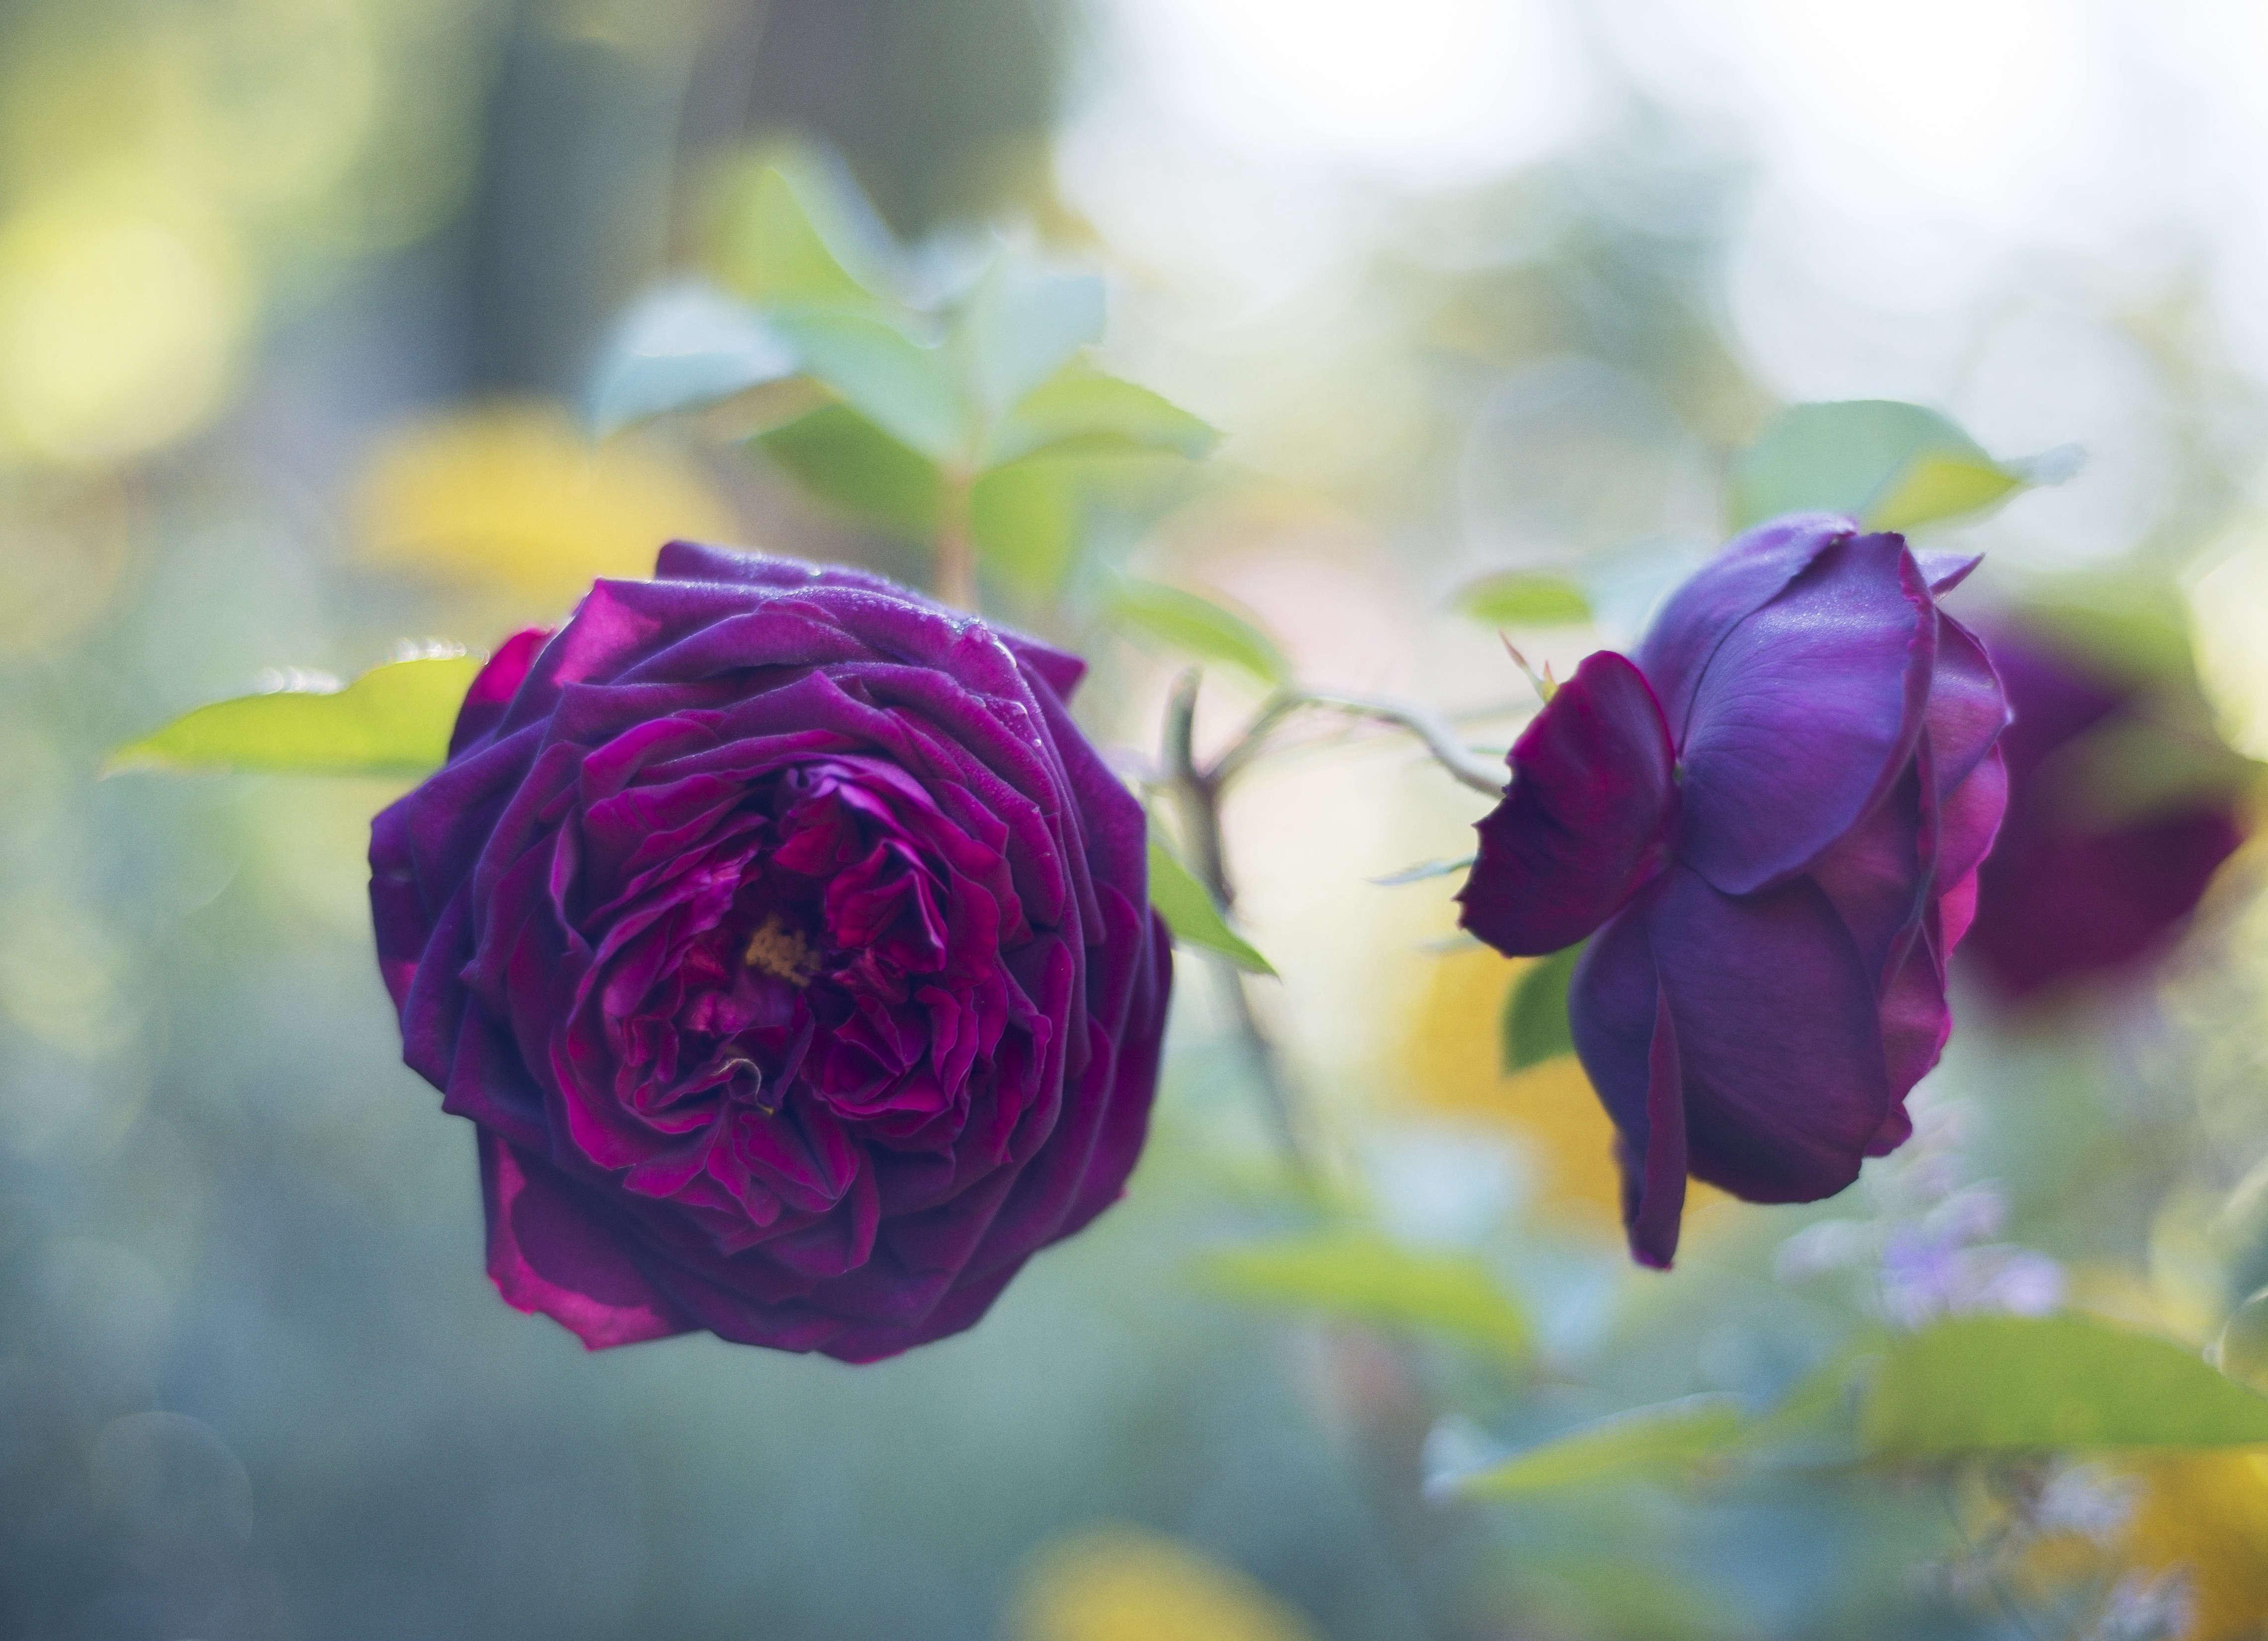 rose-the-prince-david-austin-matthew-williams-DSC-1005